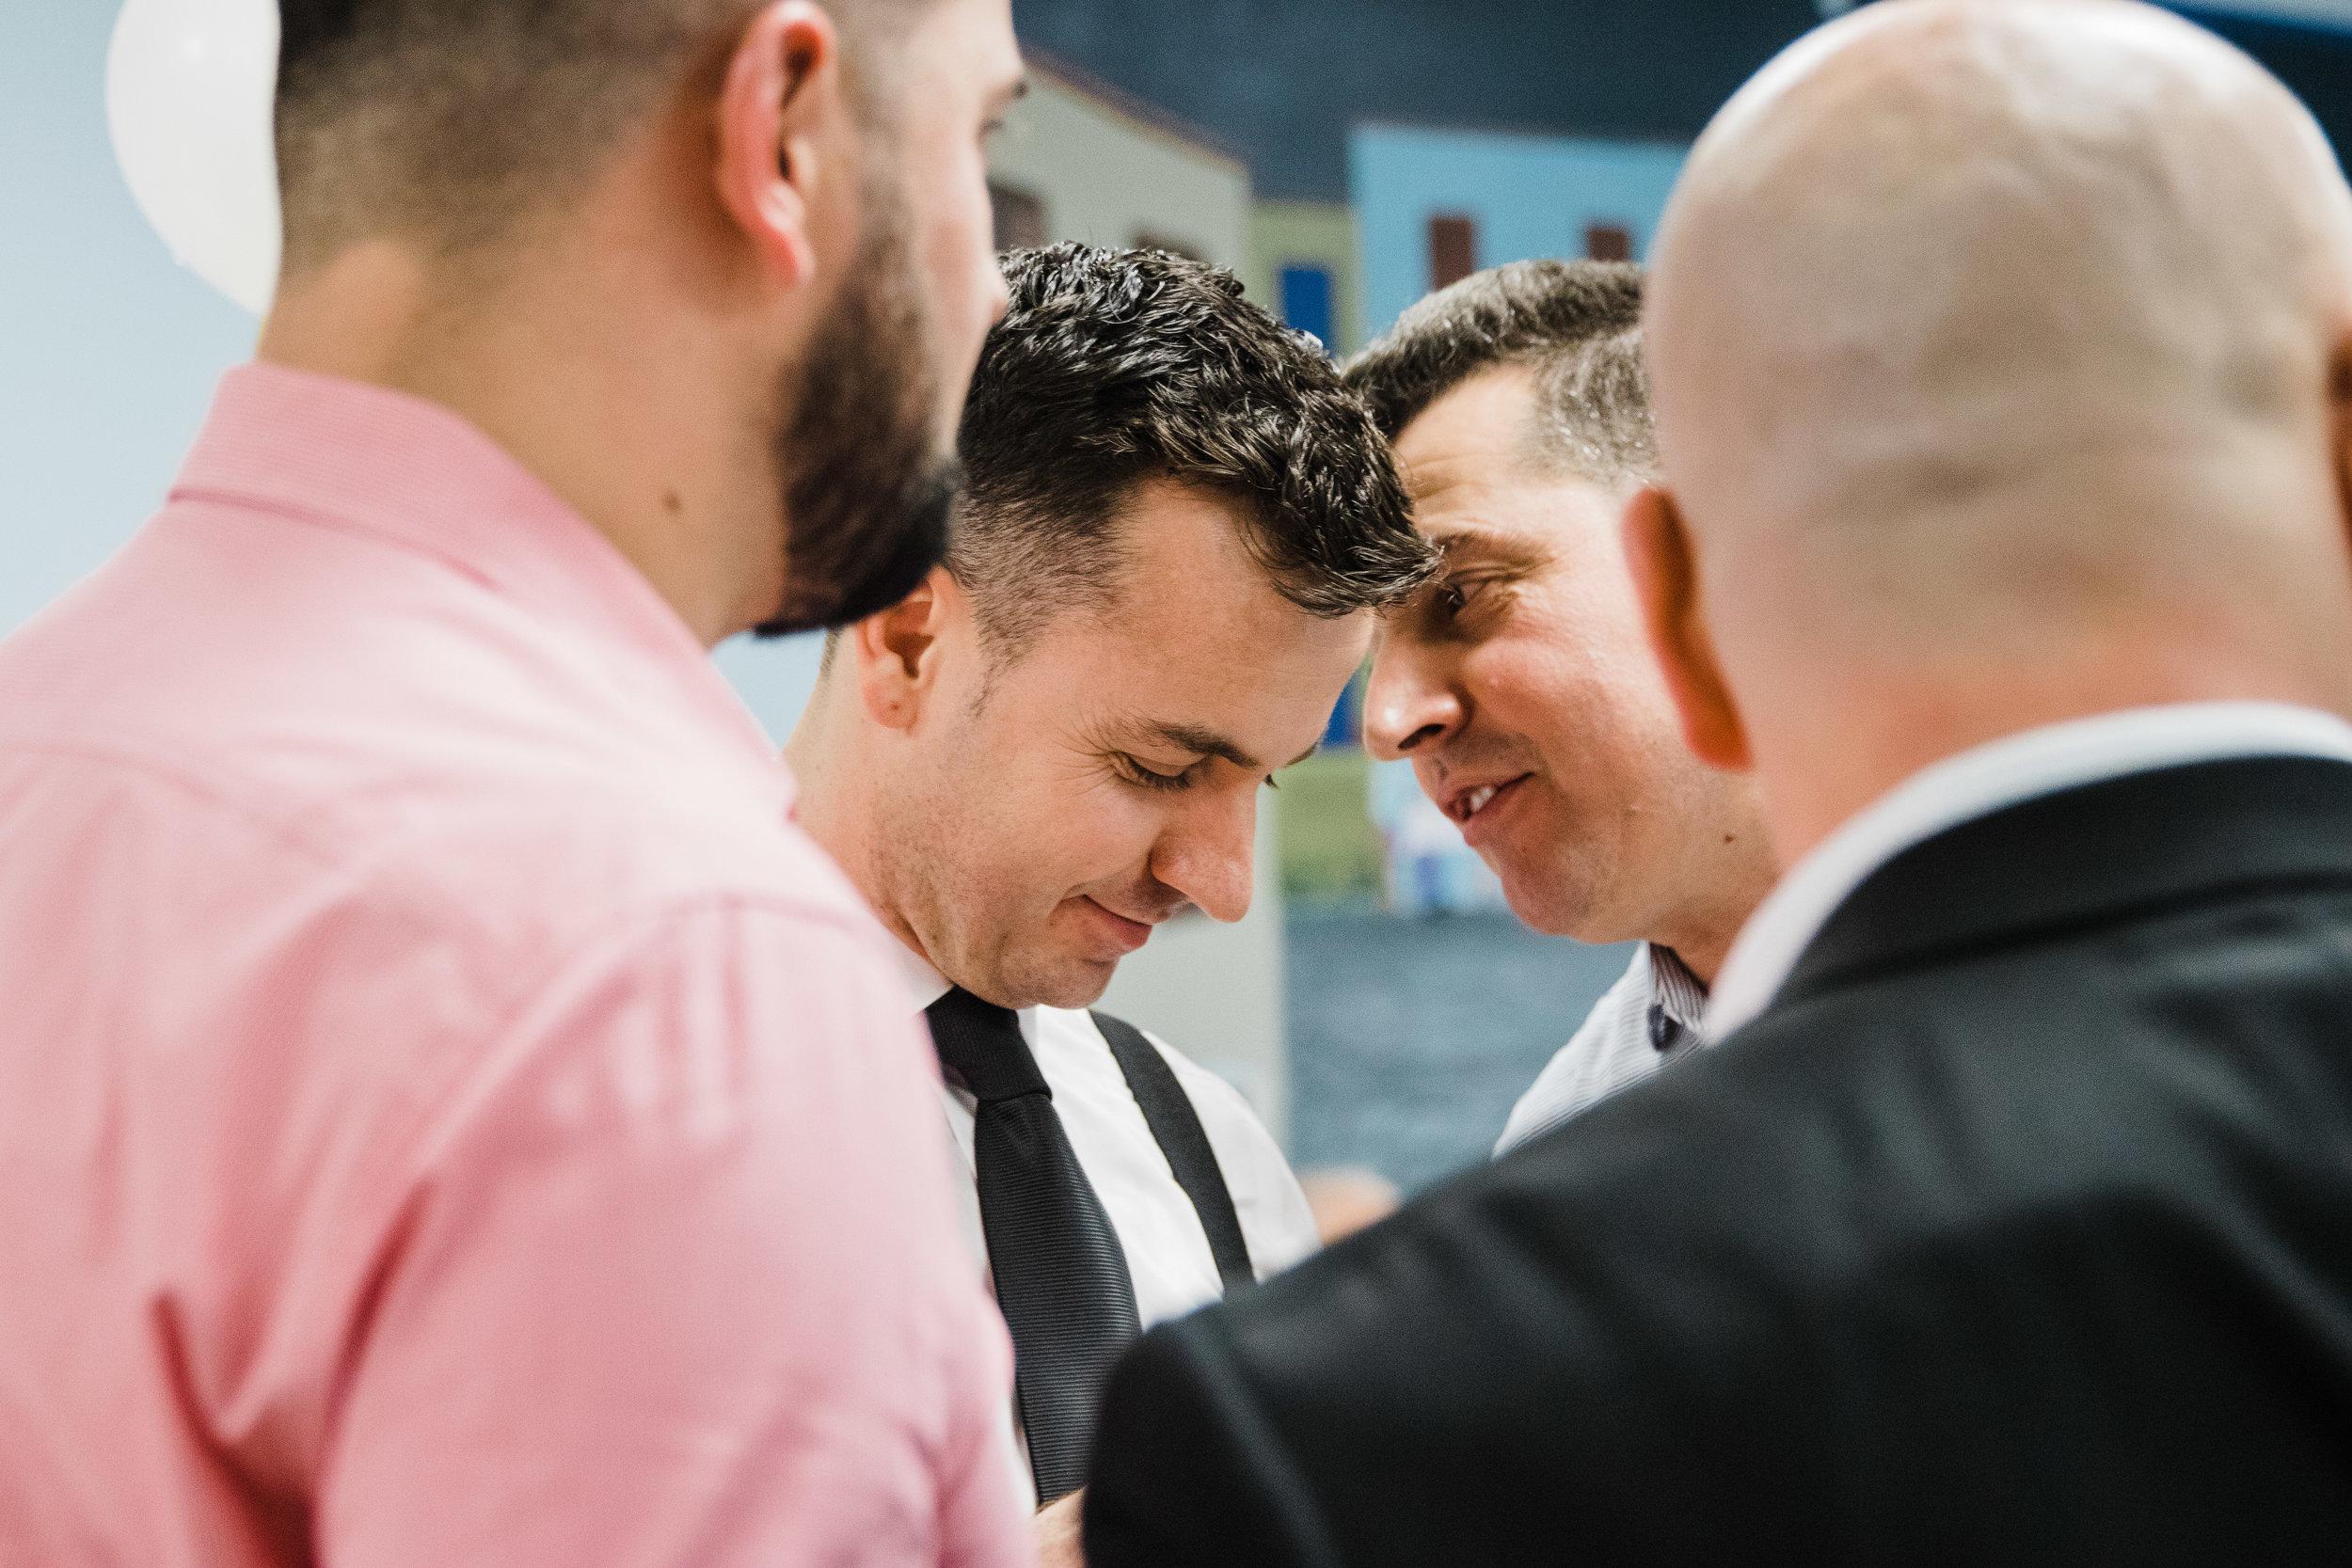 wedding-photos-jan-19-2019 (102 of 145).jpg